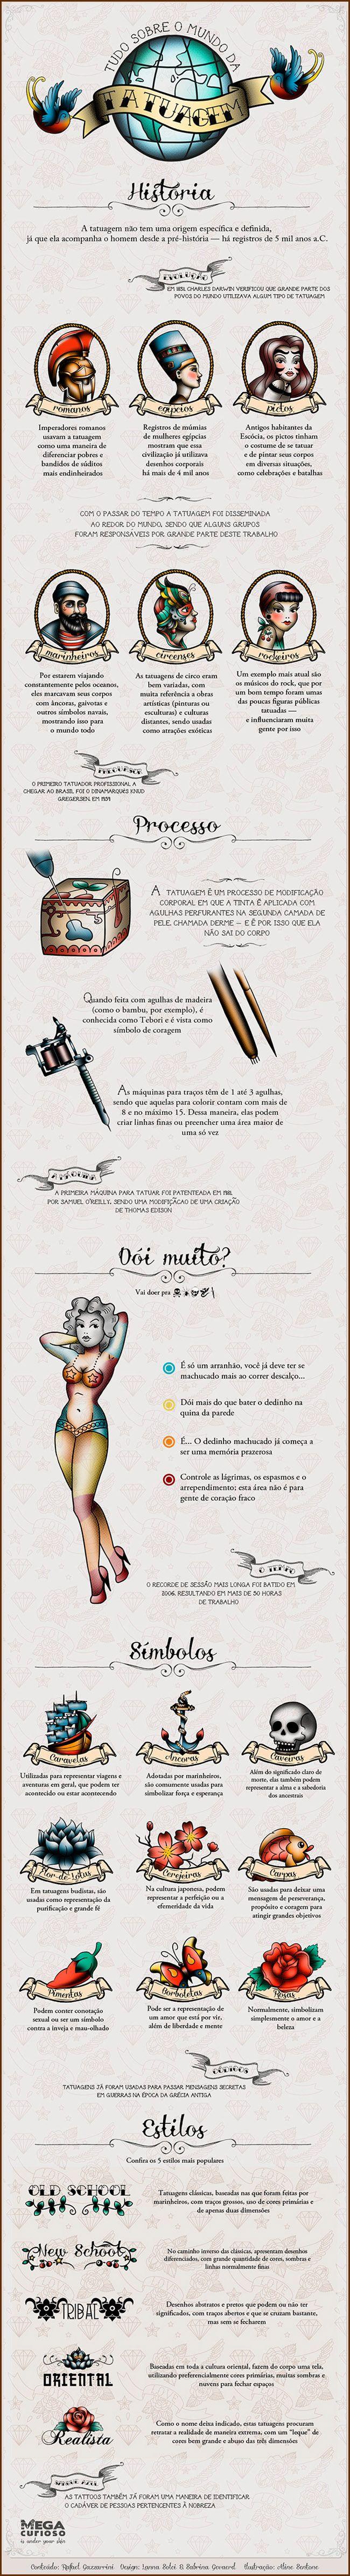 curioso mundo das tatuagens | Infografías | Pinterest